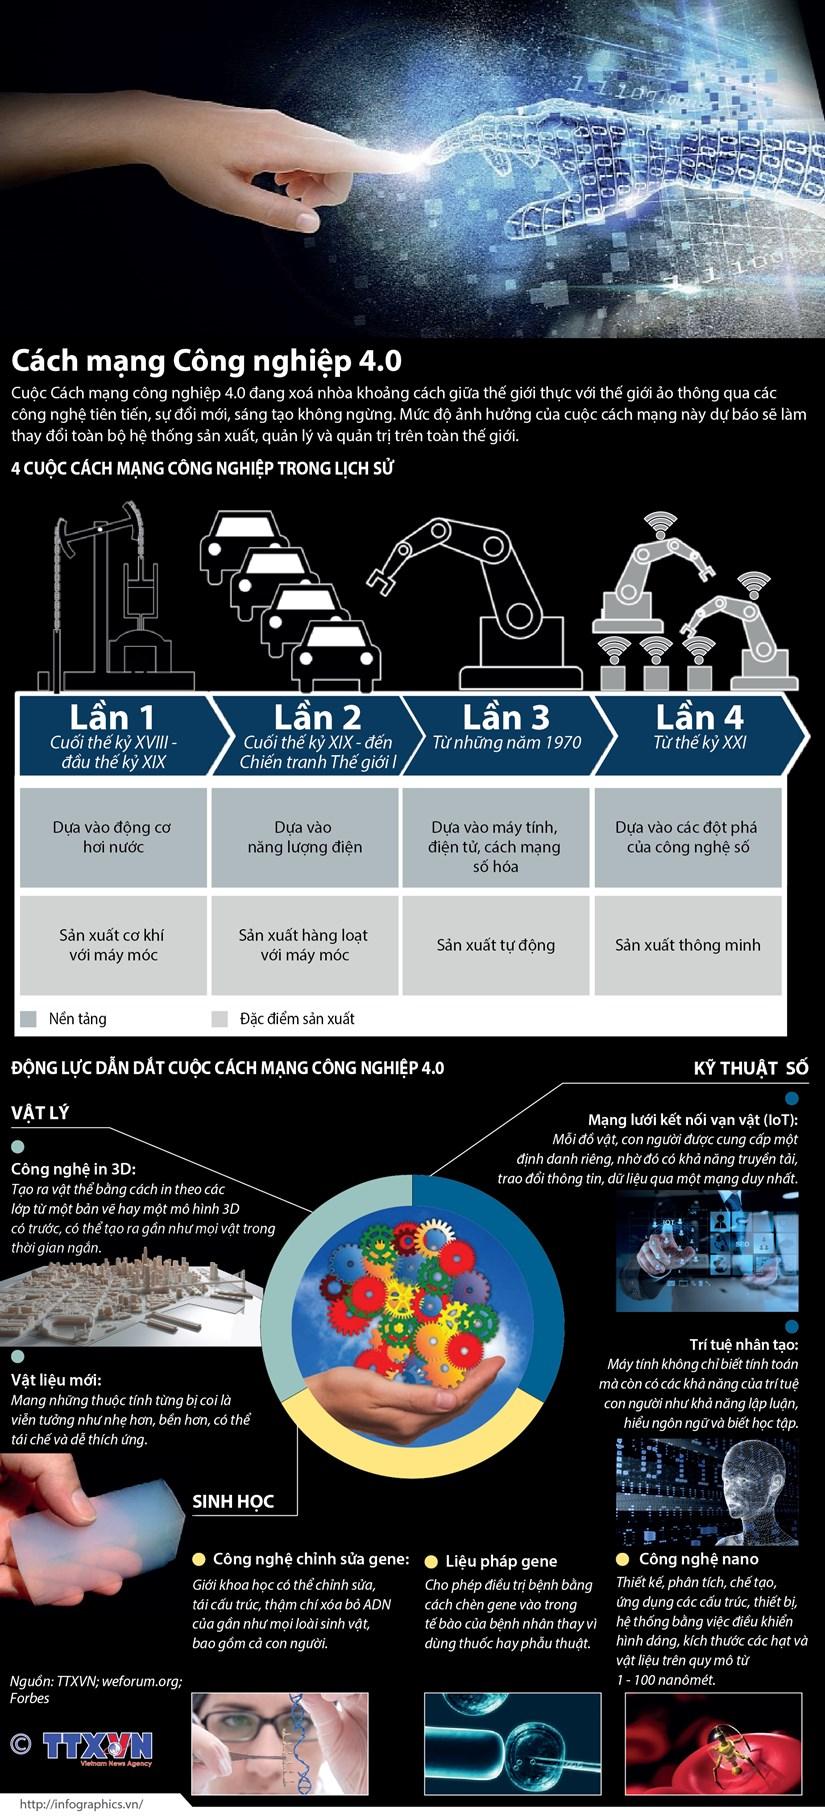 [Infographics] Cach mang cong nghiep 4.0 dua vao cong nghe so hinh anh 1